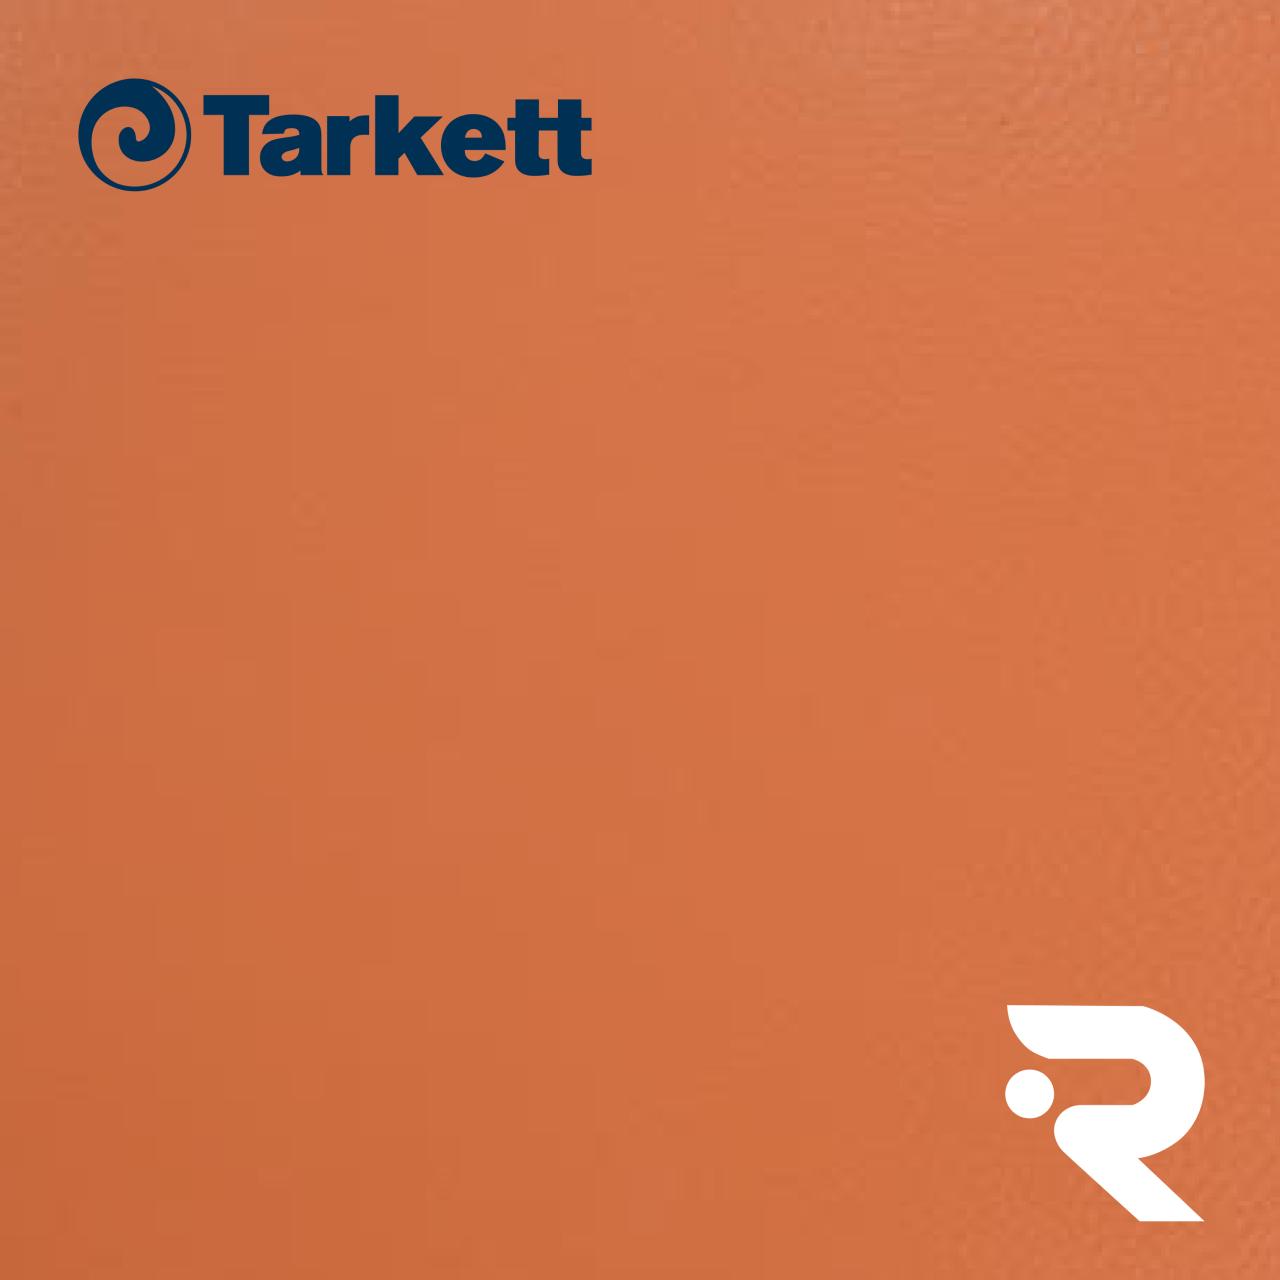 🏐 Спортивне покриття Tarkett | ORANGE | OMNISPORTS V35 | 2 х 20.5 м